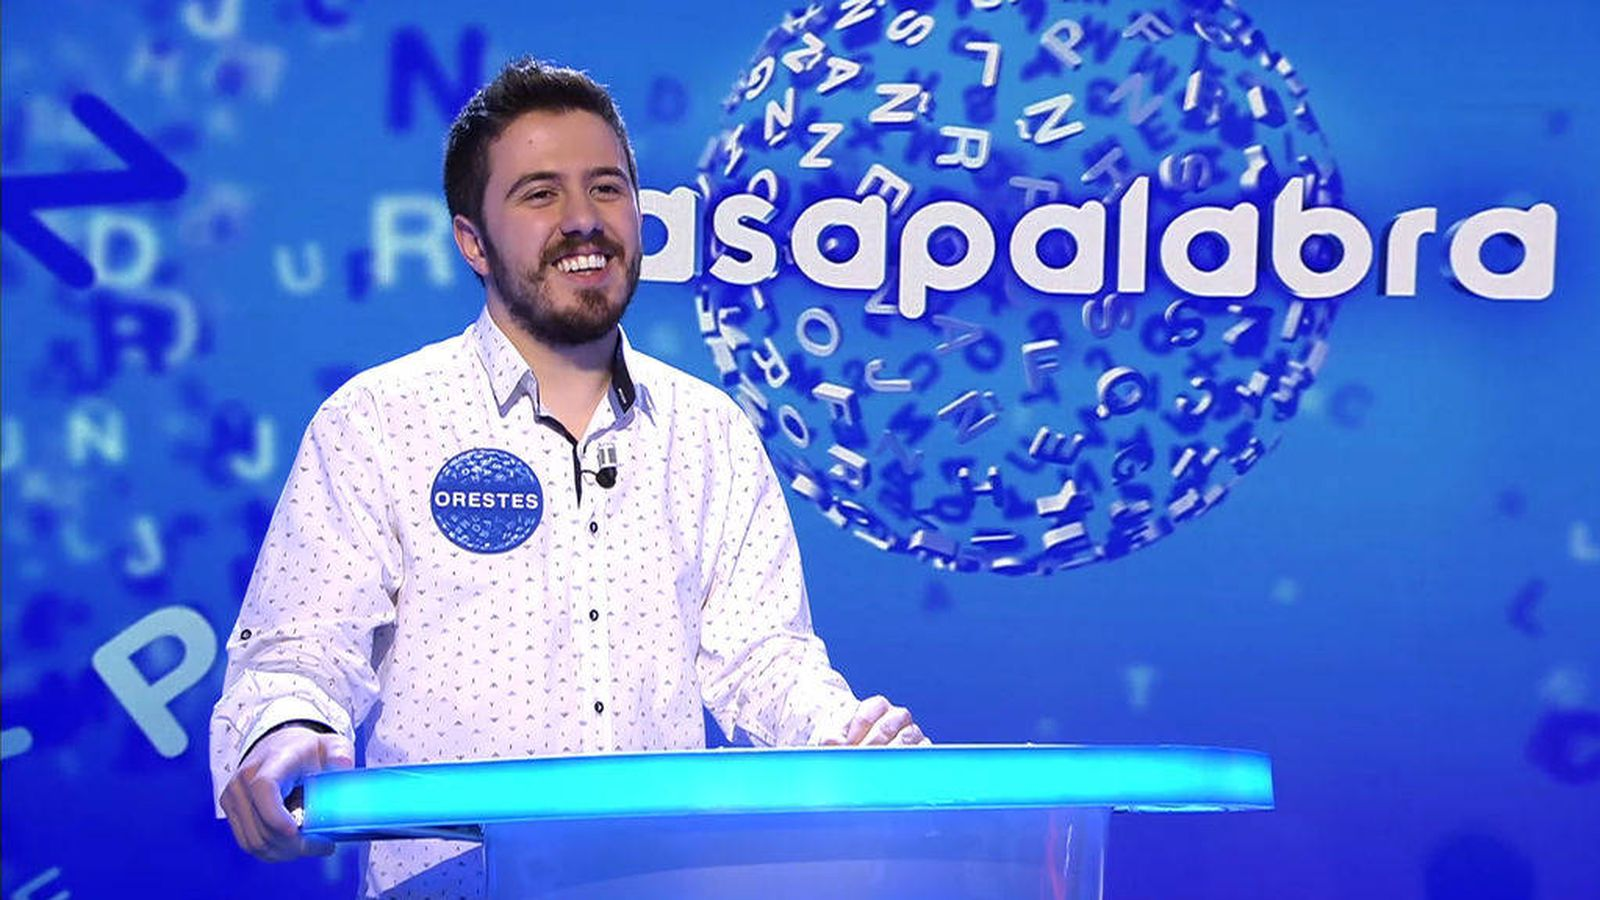 Foto: Orestes Barbero, concursante burgalés de 'Pasapalabra'. (Mediaset)